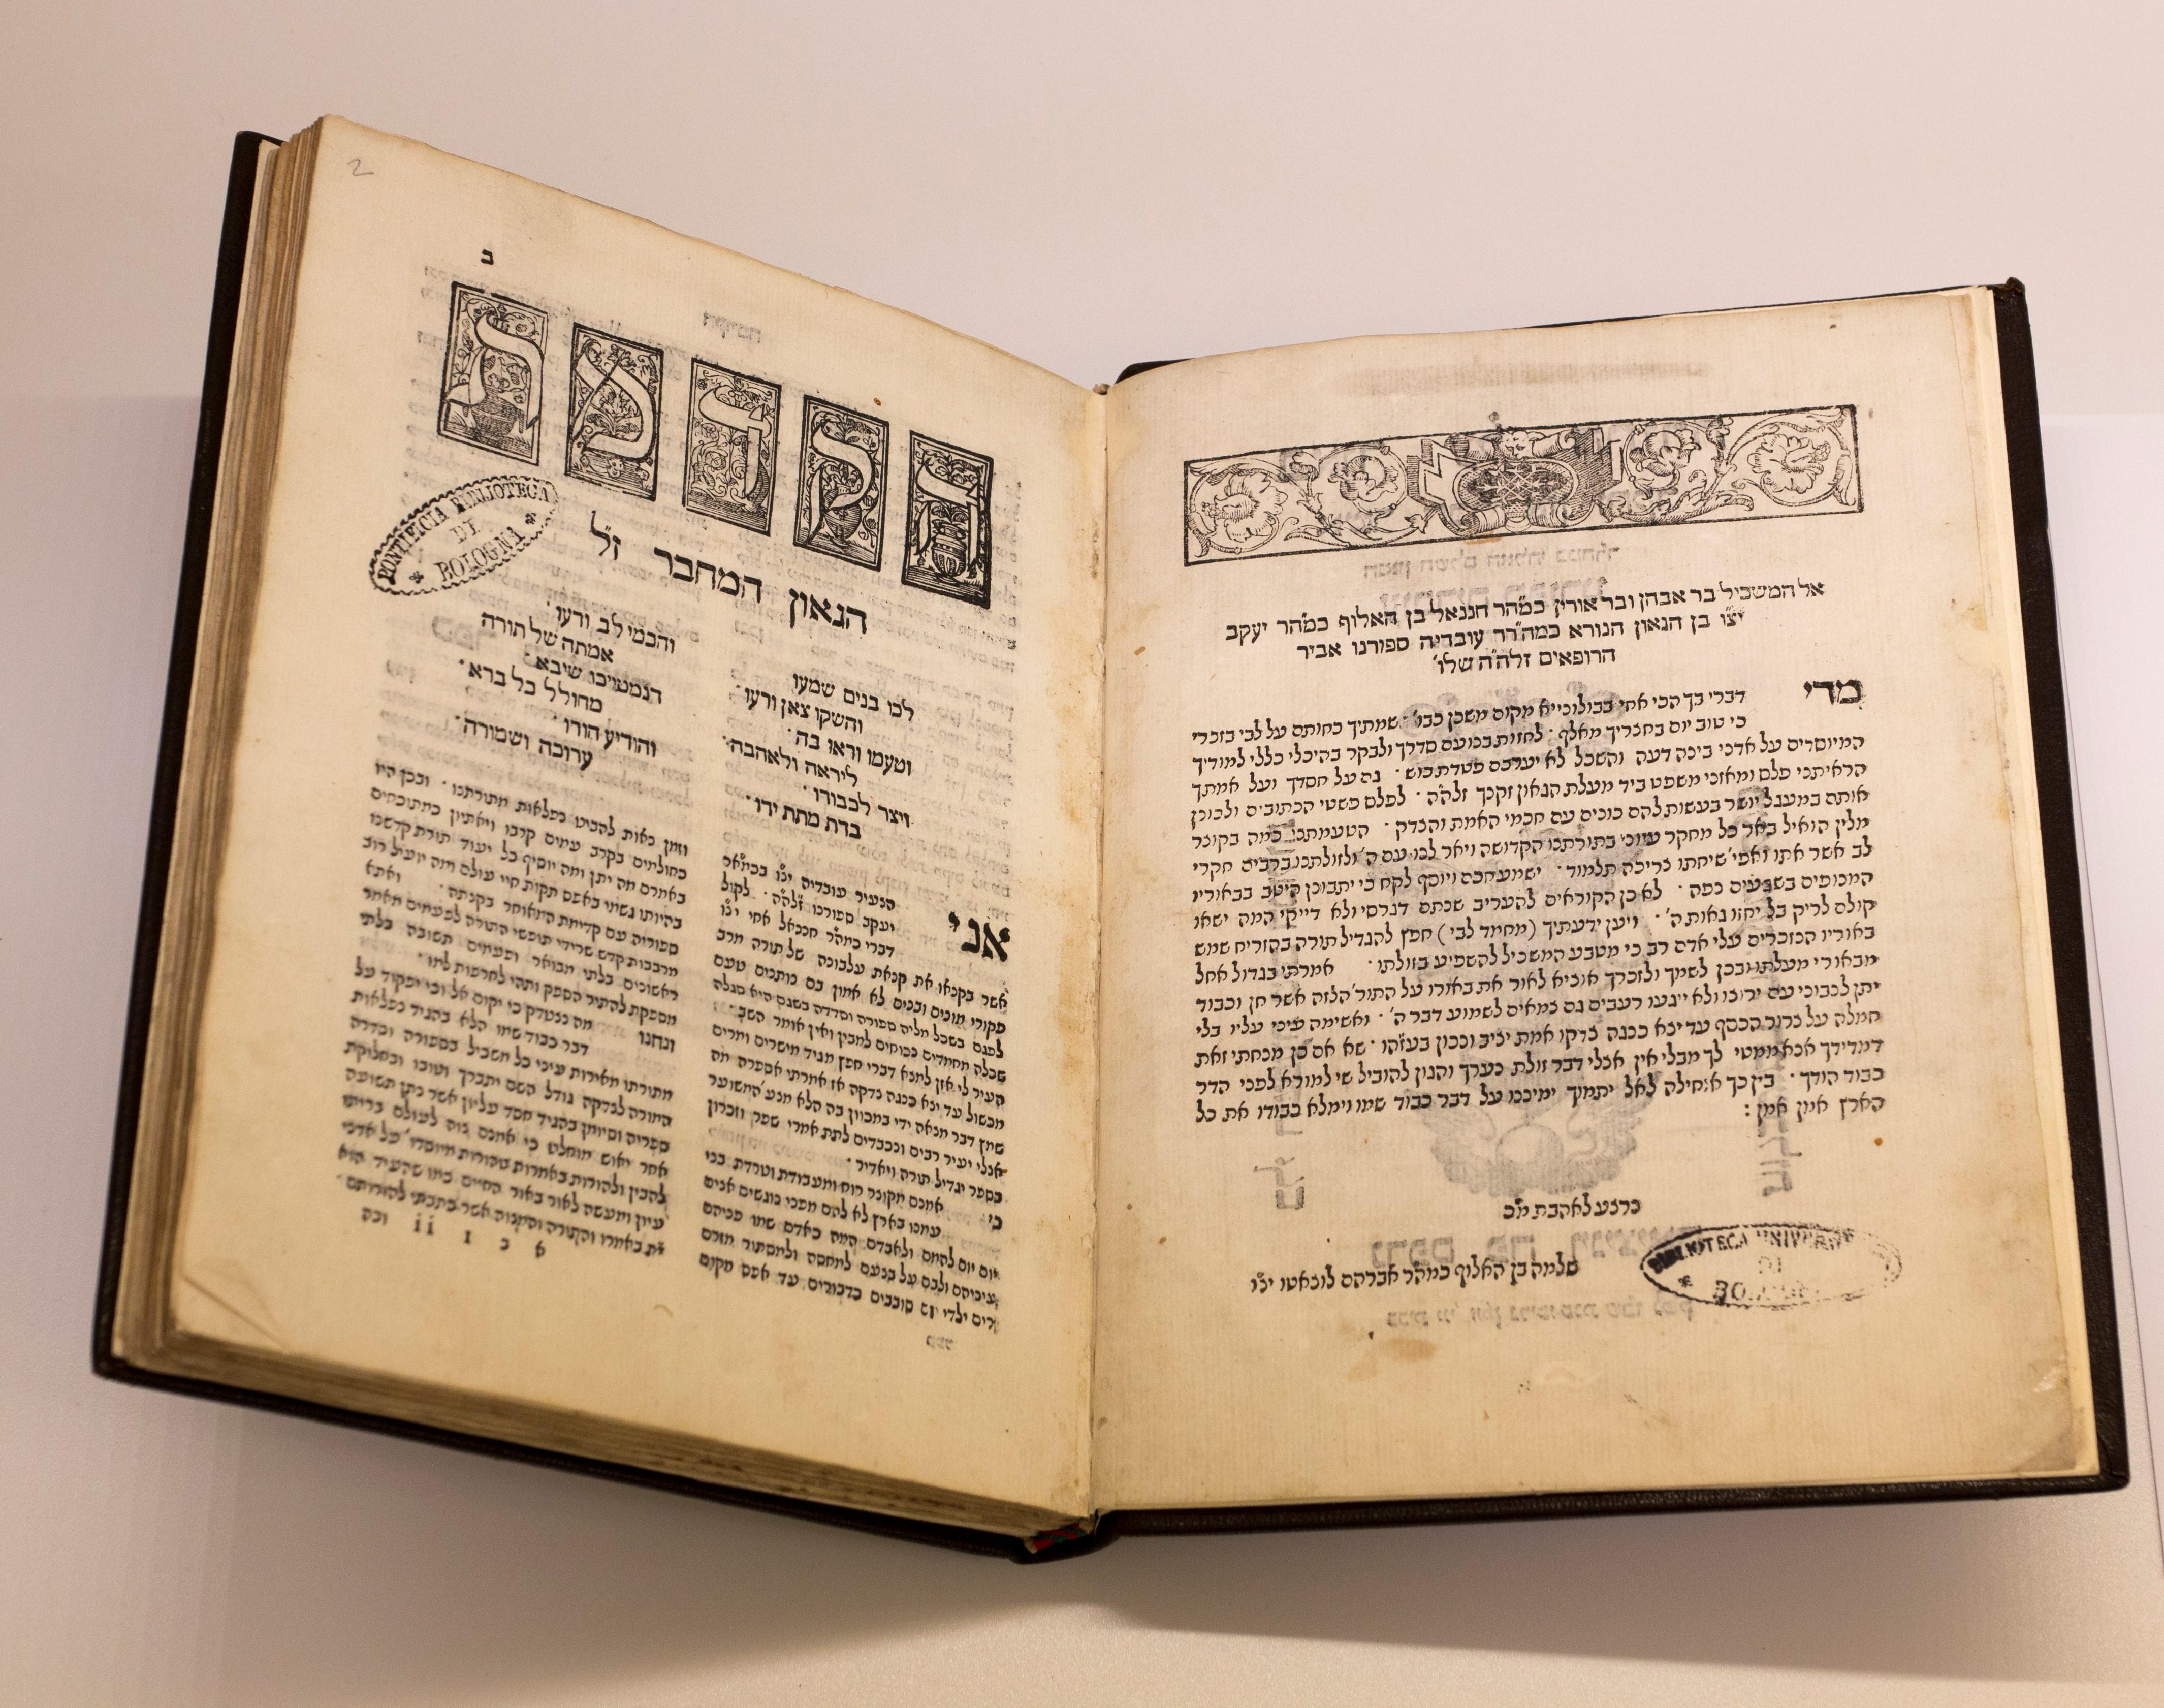 Biblioteca Universitaria di Bologna, A.M. OO.III.25